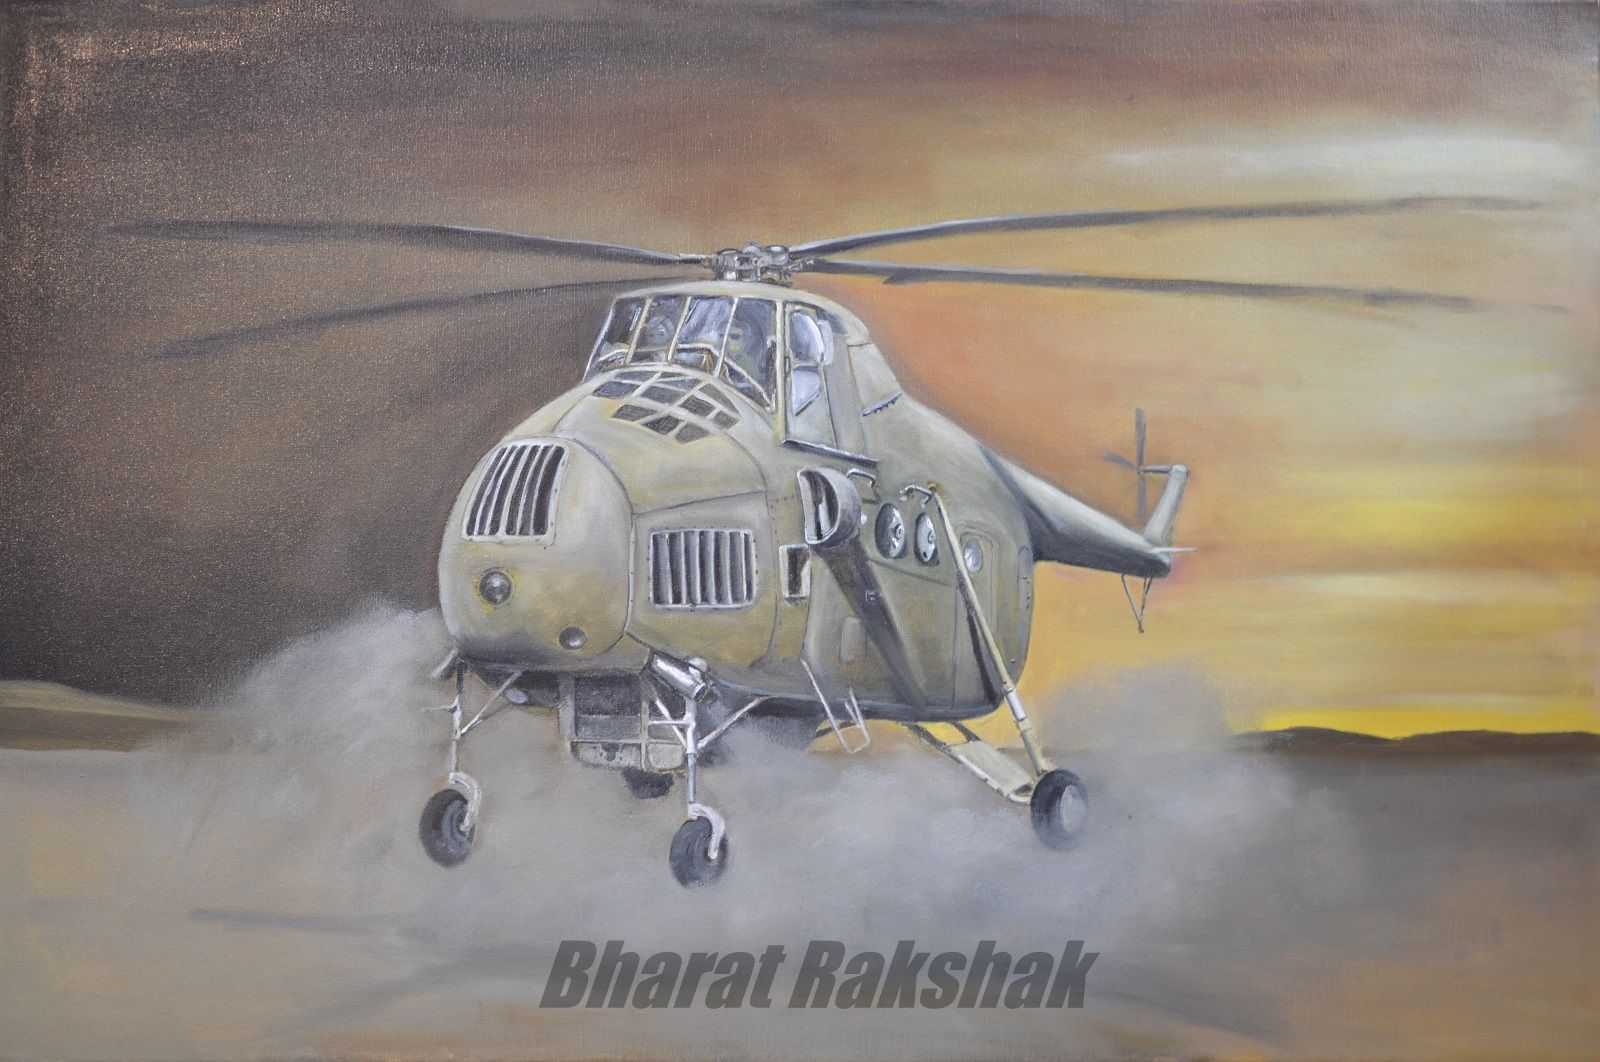 BharatRakshak Indian Air Force| Rotary-Workhorse-Mi-4